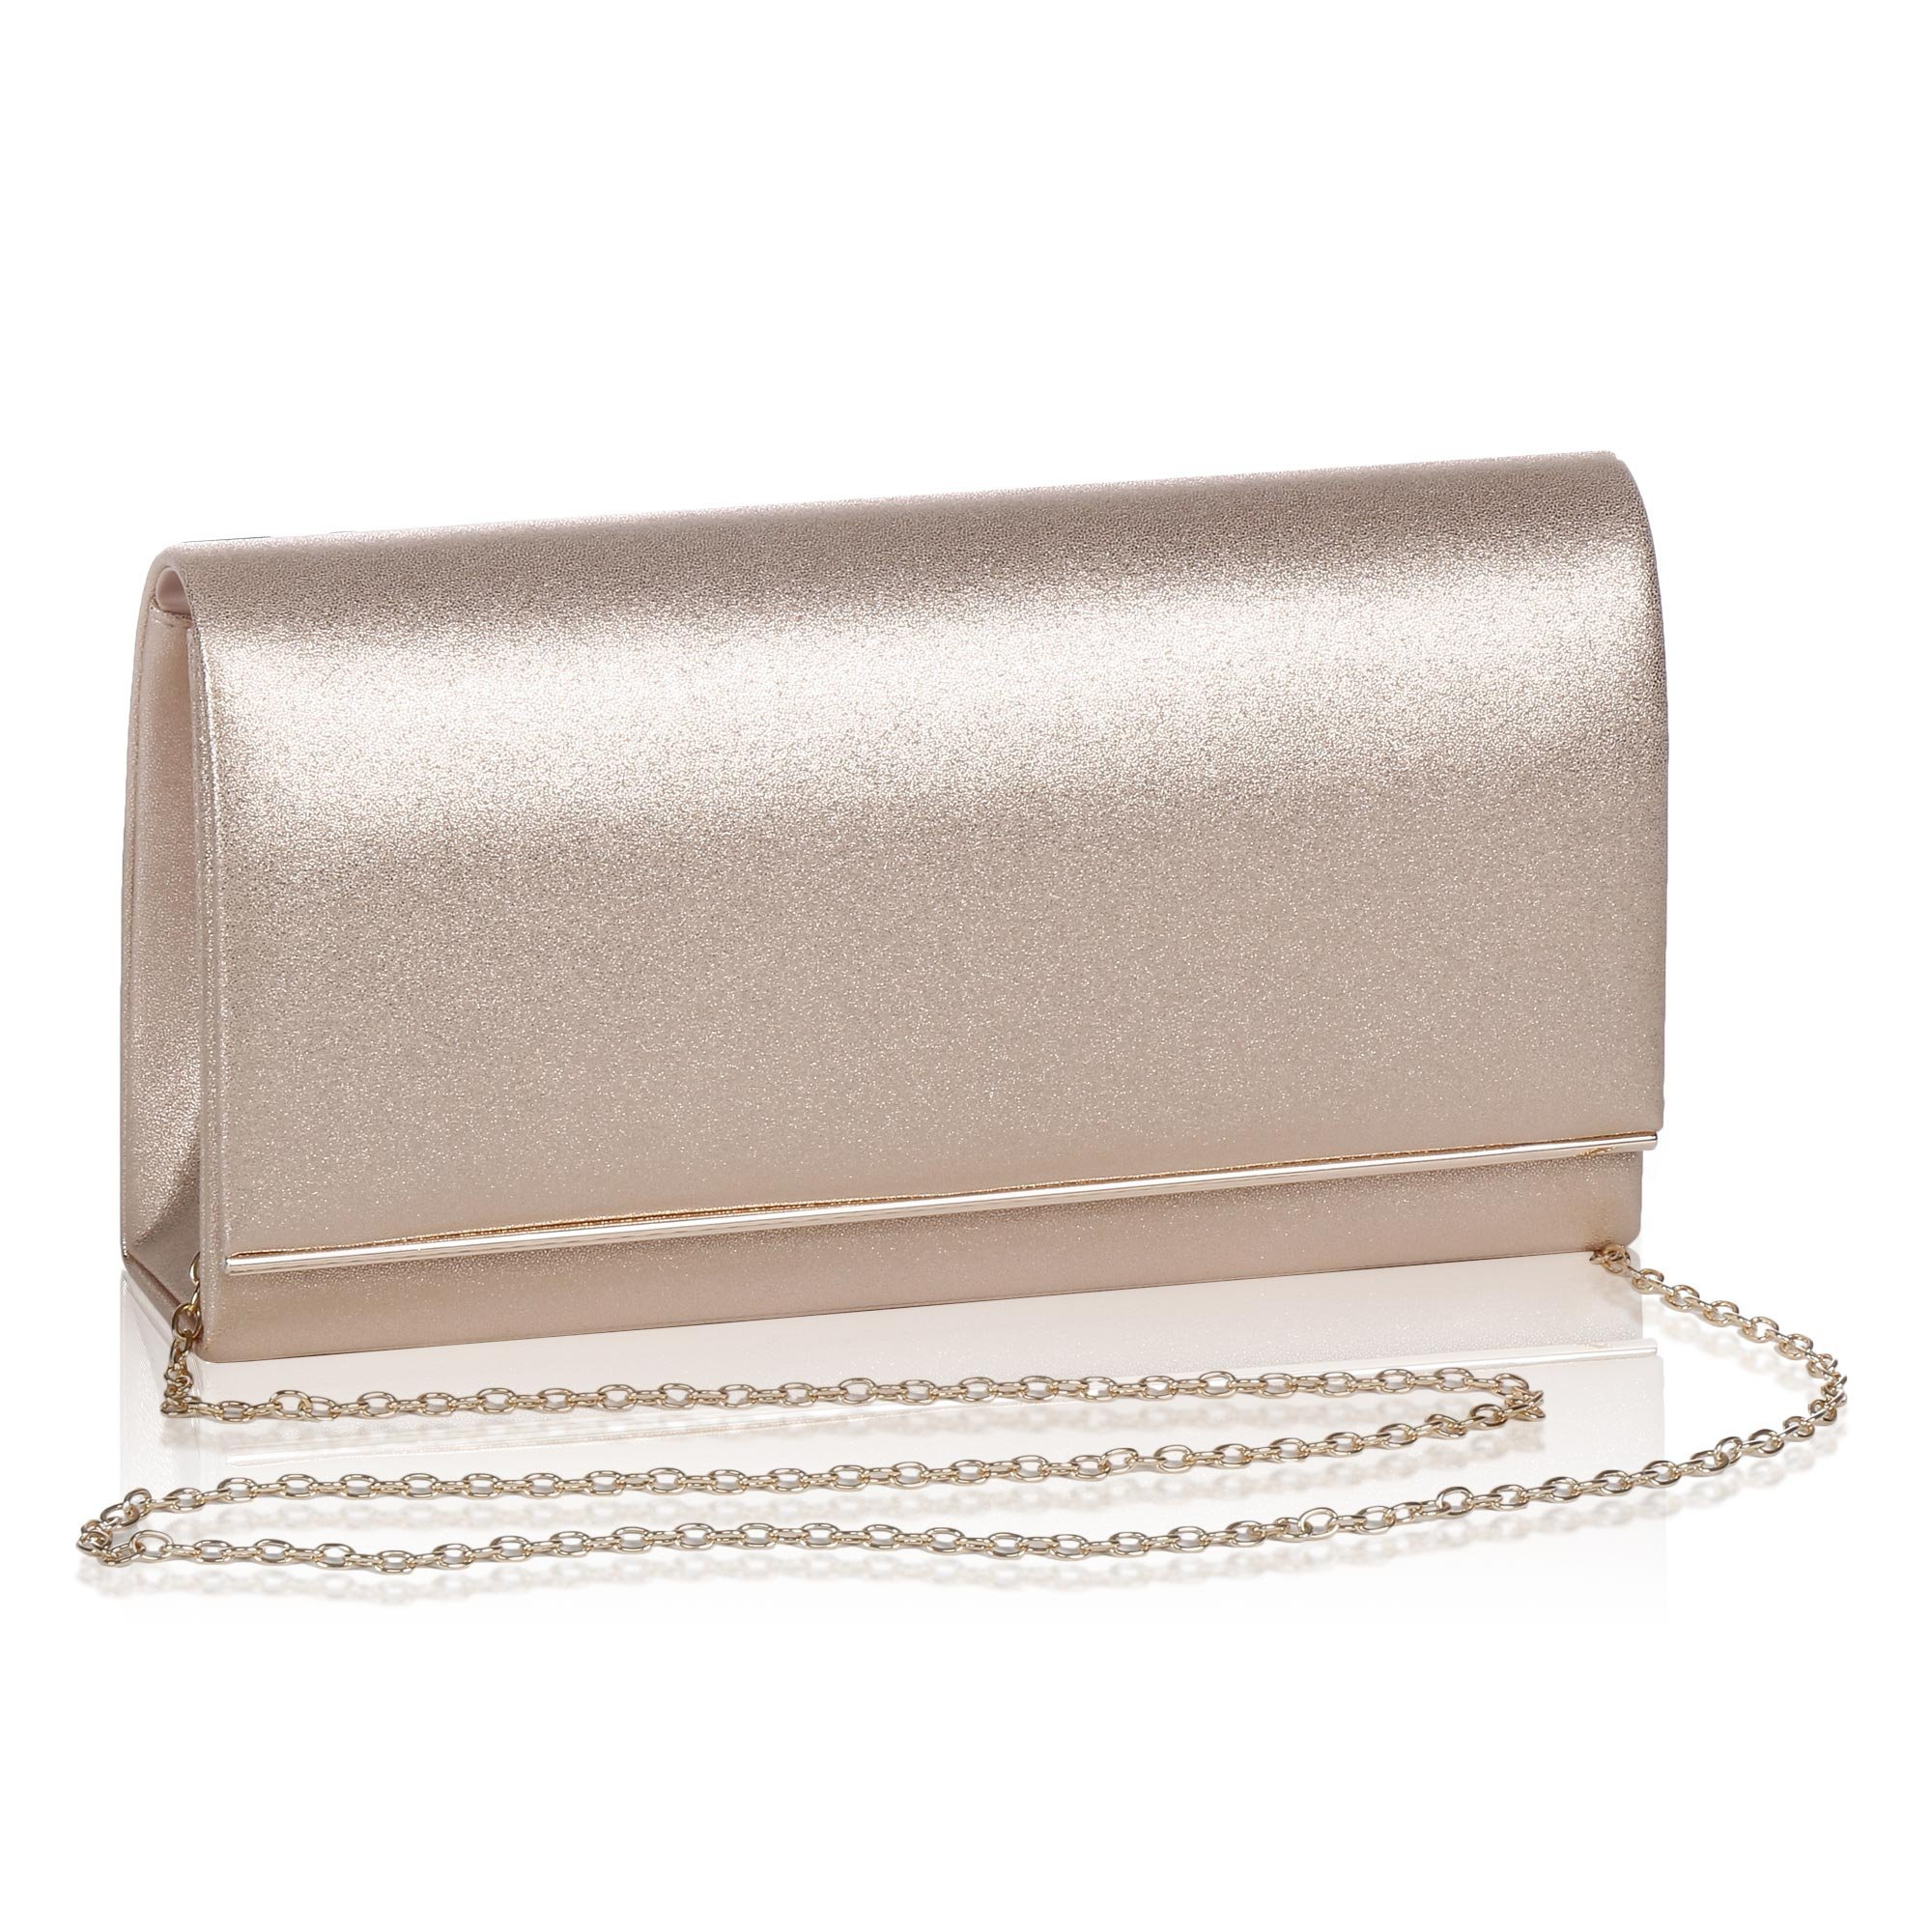 Womens Metallic Glitter Flap Clutch,Wallyns Evening Bag Handbag Solid Color RoseGold